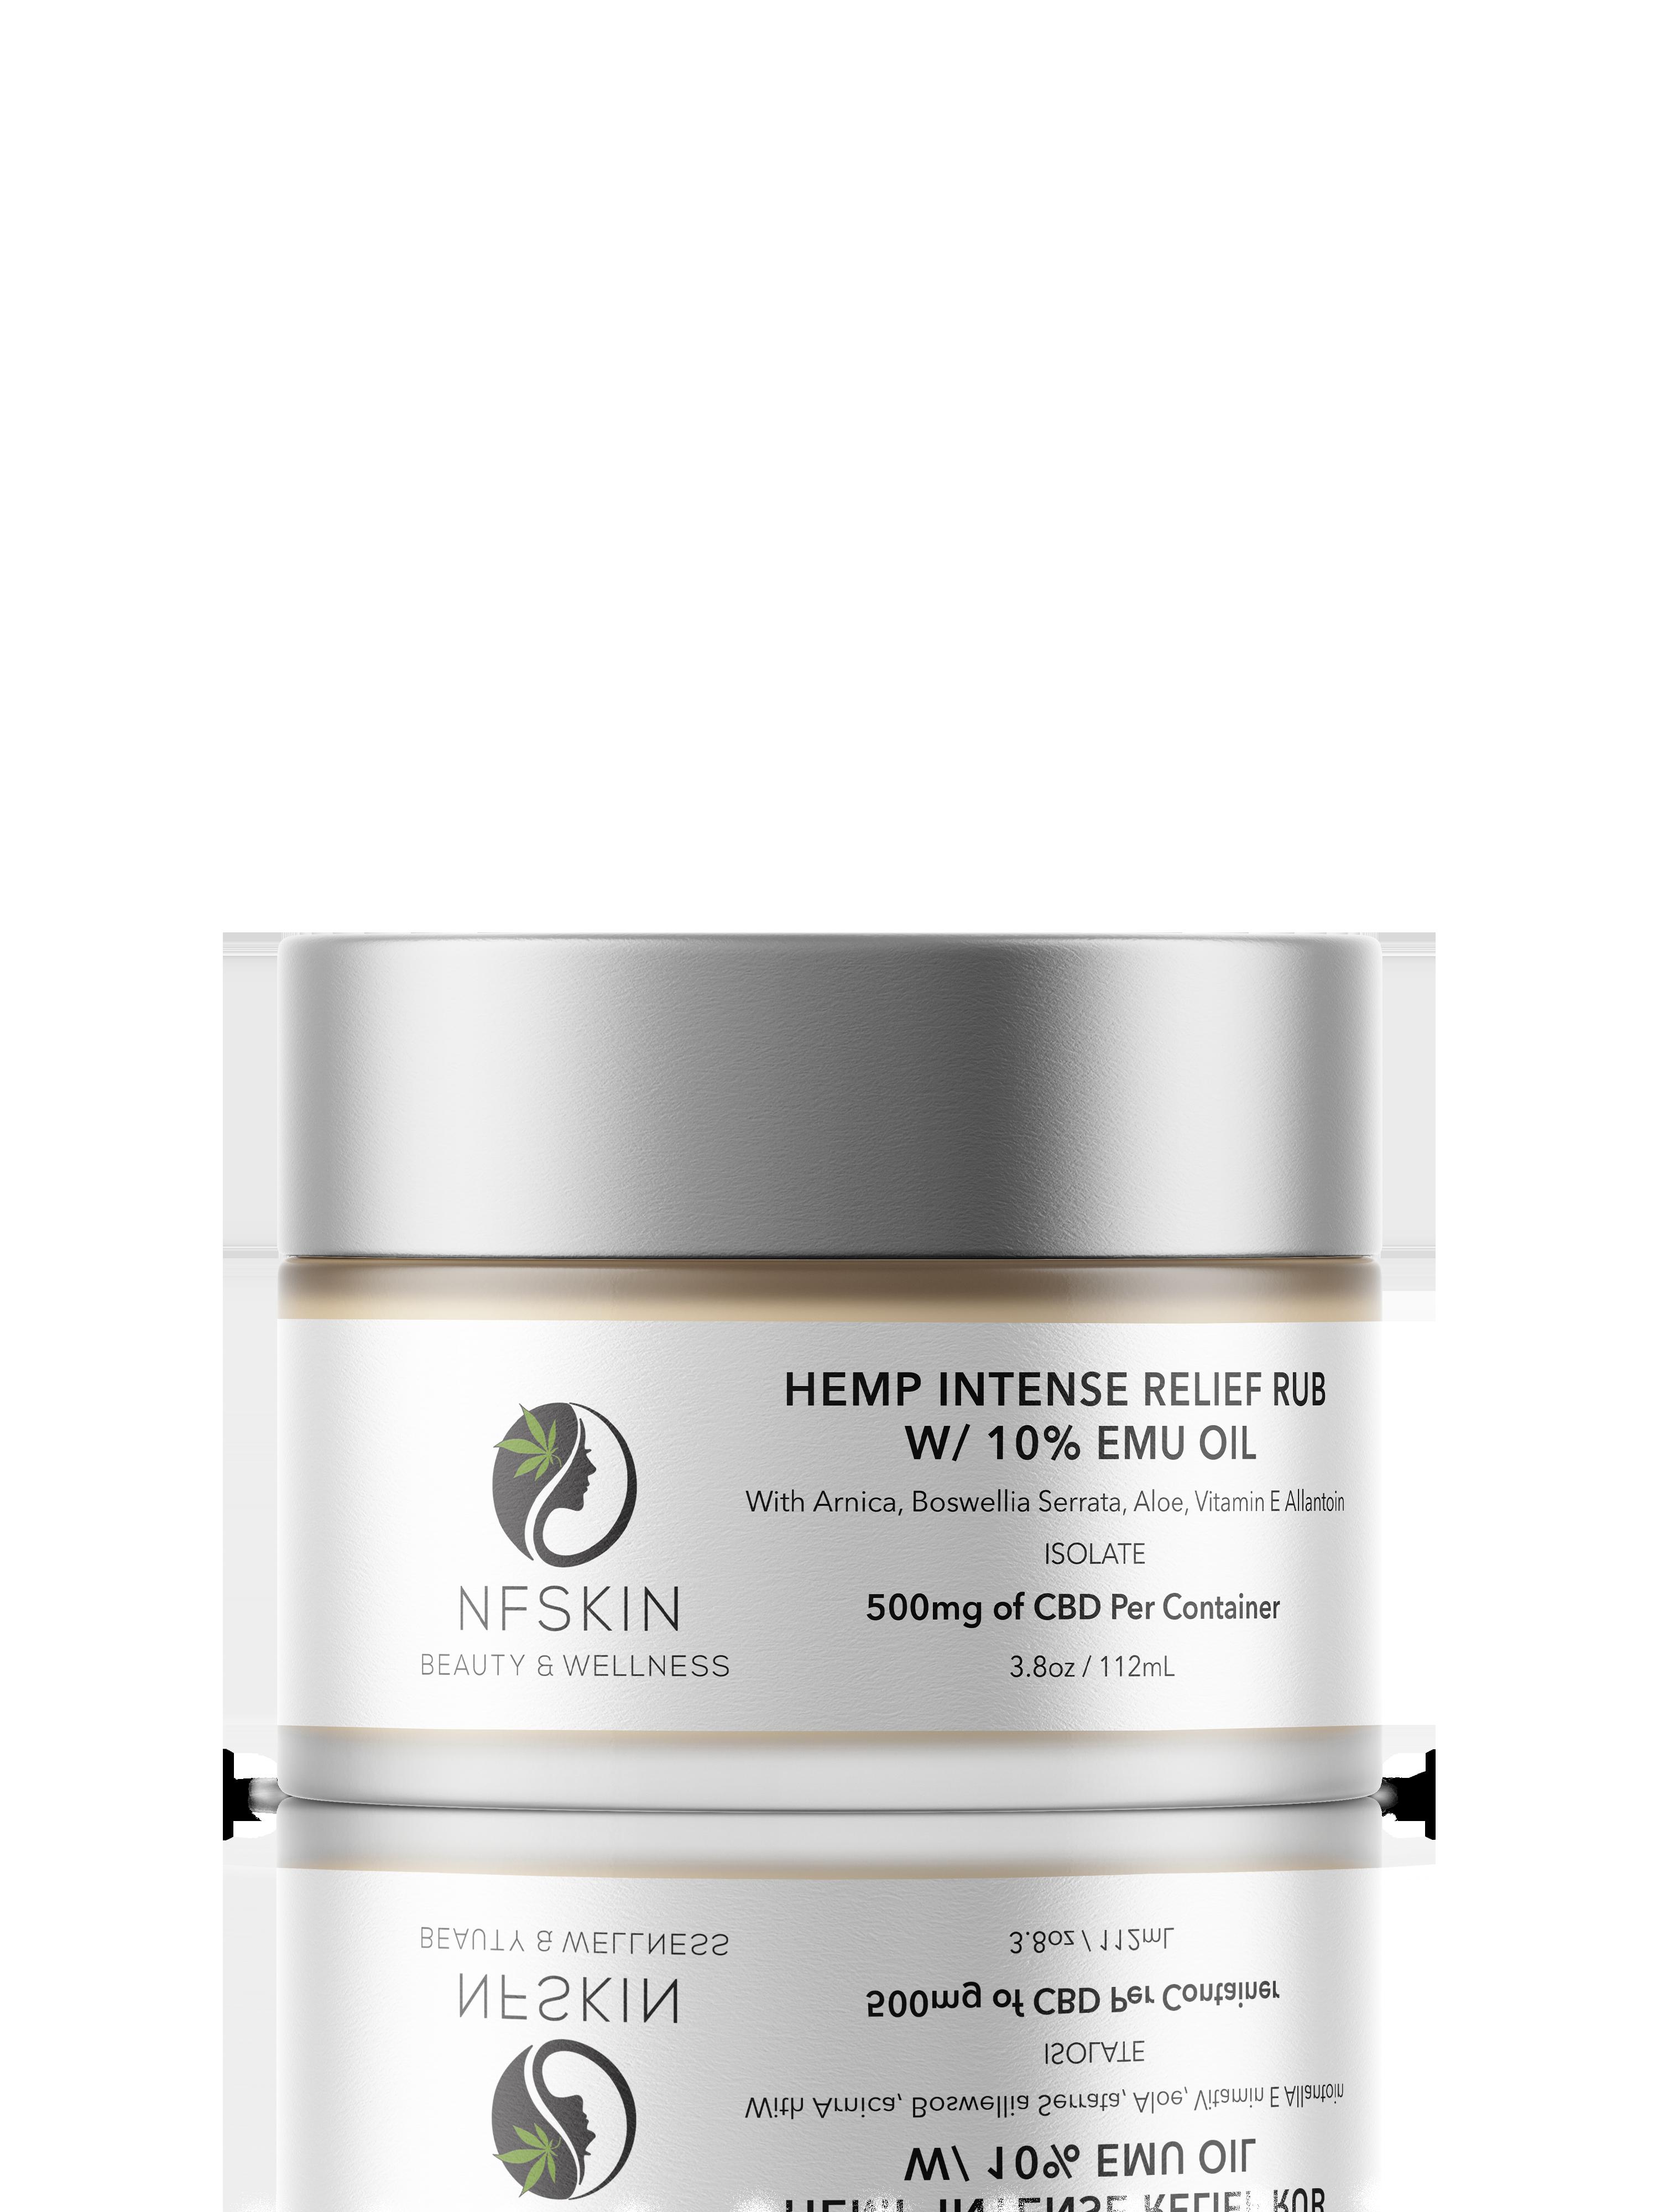 Hemp Intense Relief Rub w/ 10% Emu Oil – 500mg